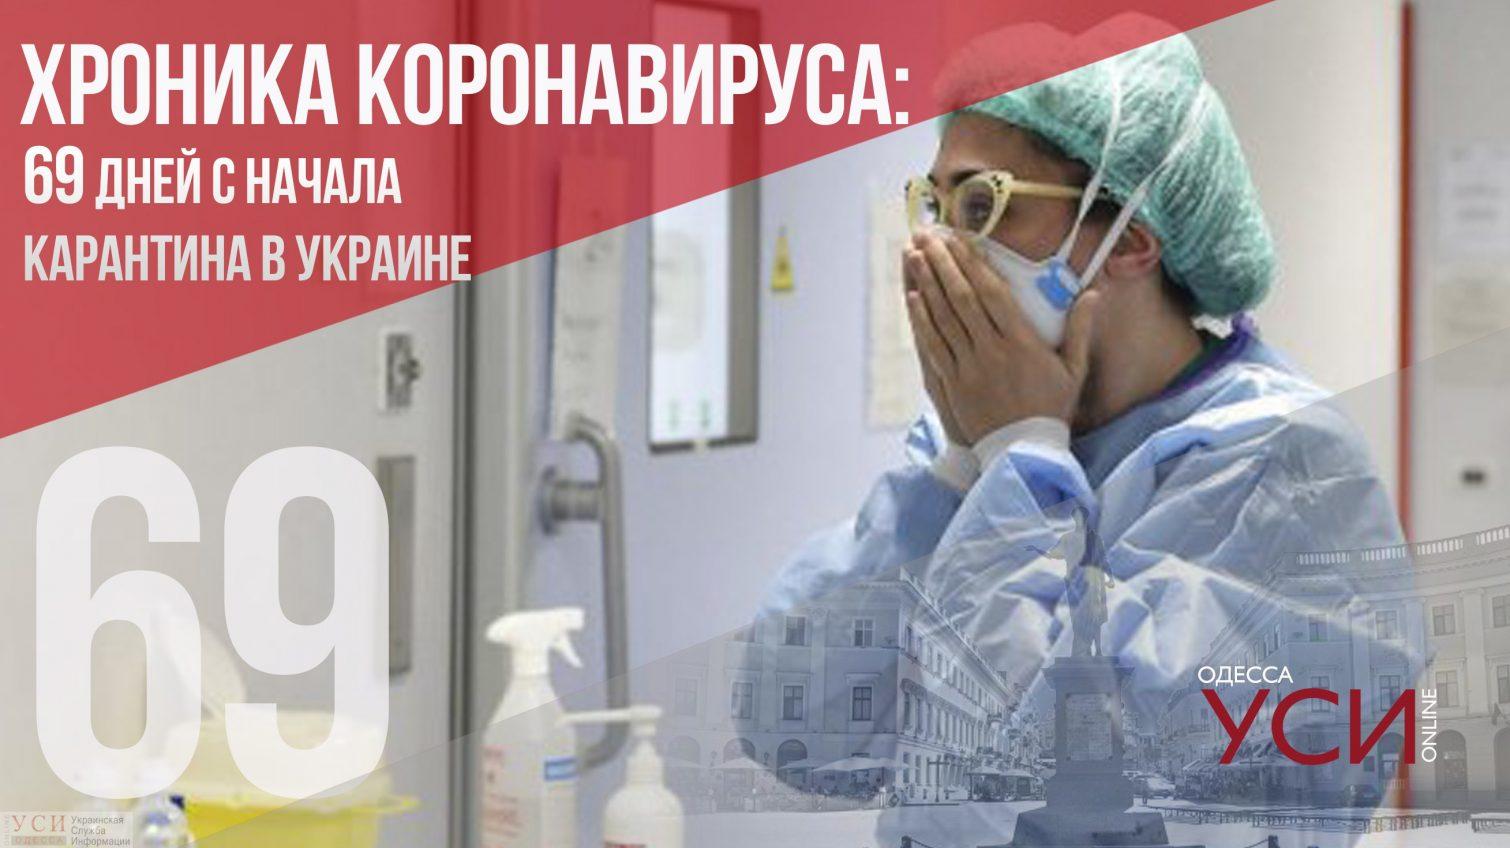 Хроника коронавируса: 69 дней с начала карантина в Украине ОБНОВЛЯЕТСЯ «фото»